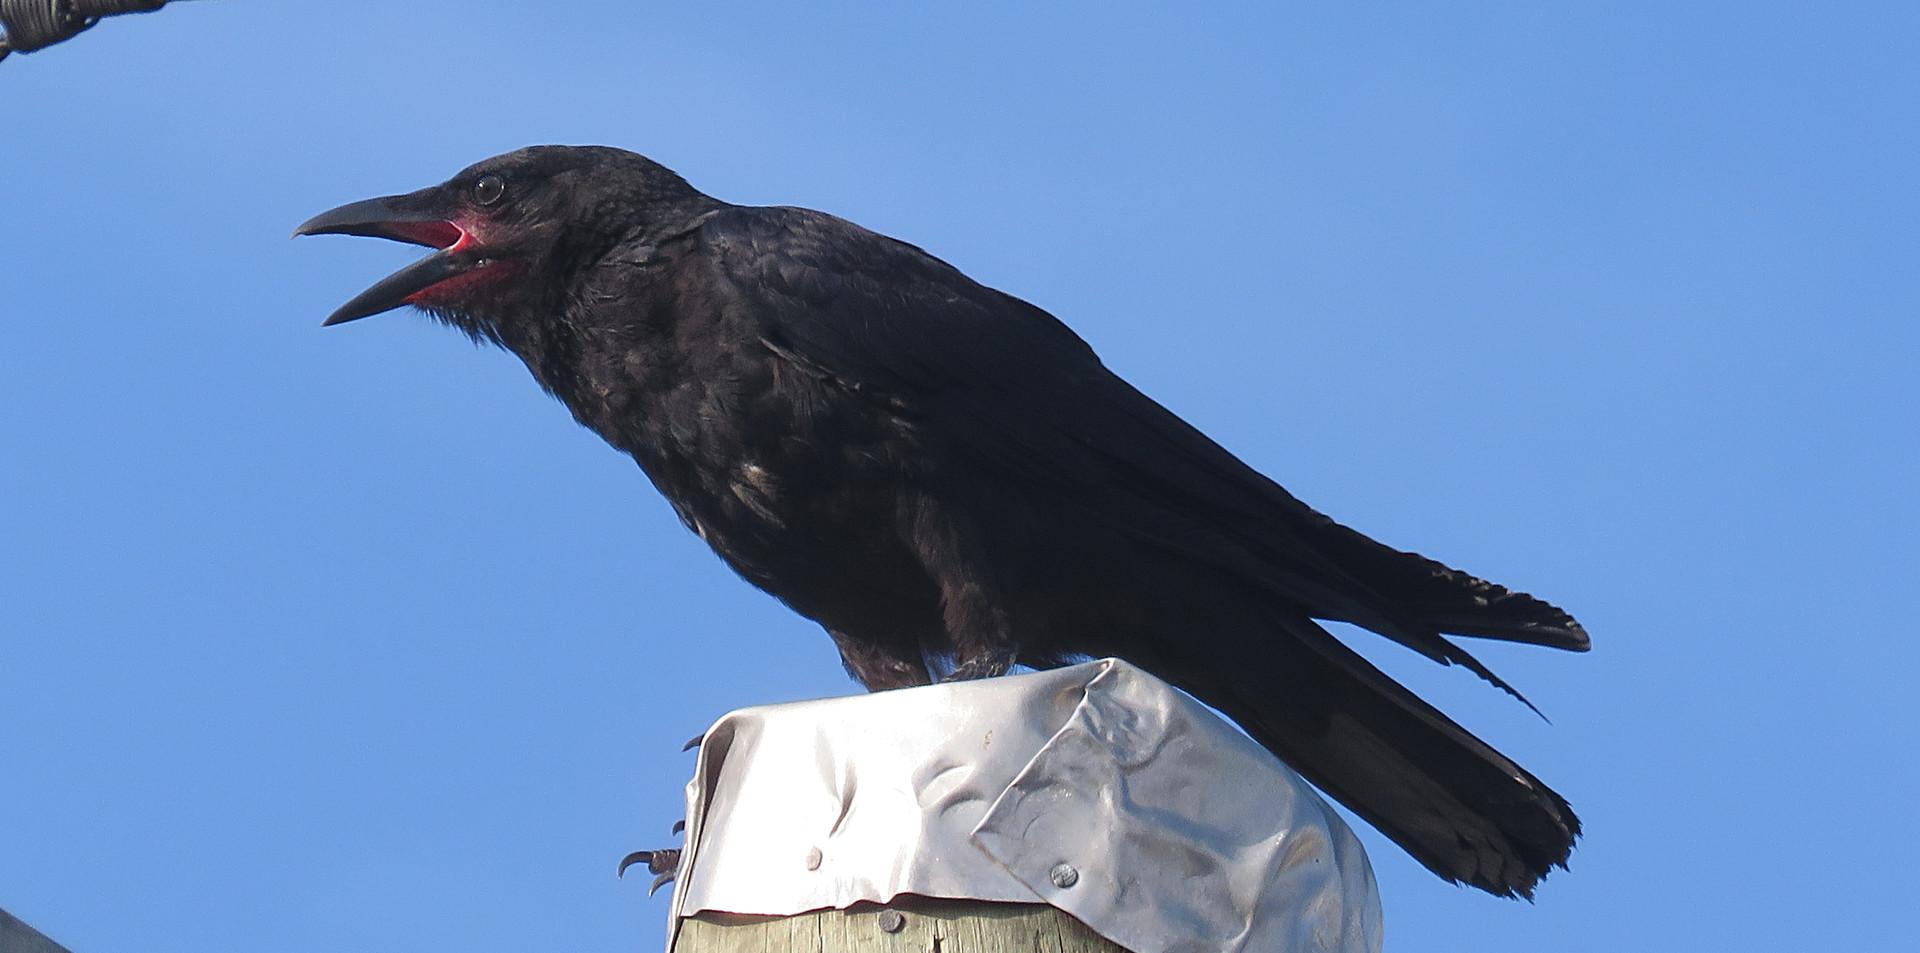 Juvenile Torresian Crow